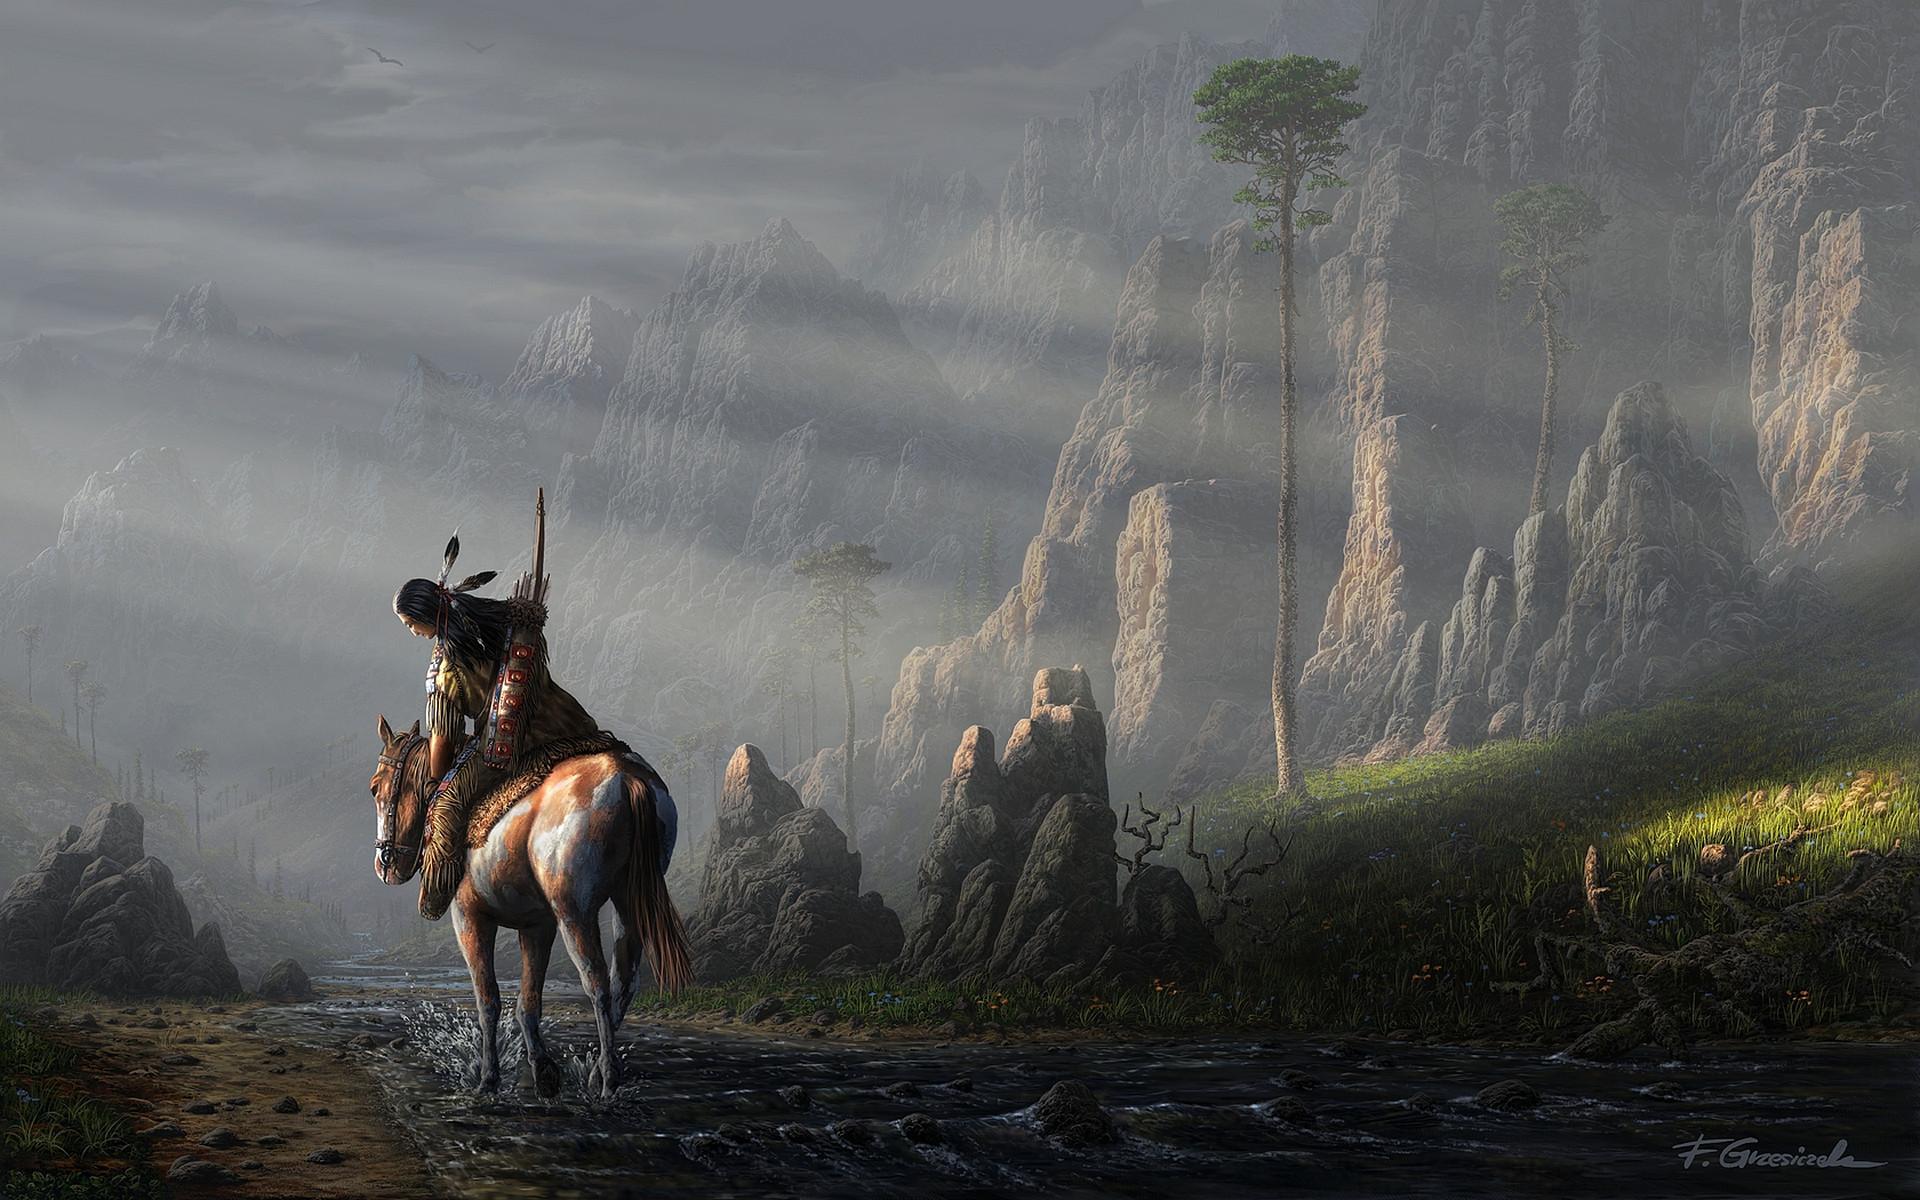 Hd Wallpapers Horse Wallpaper Native American Wallpaper Hd